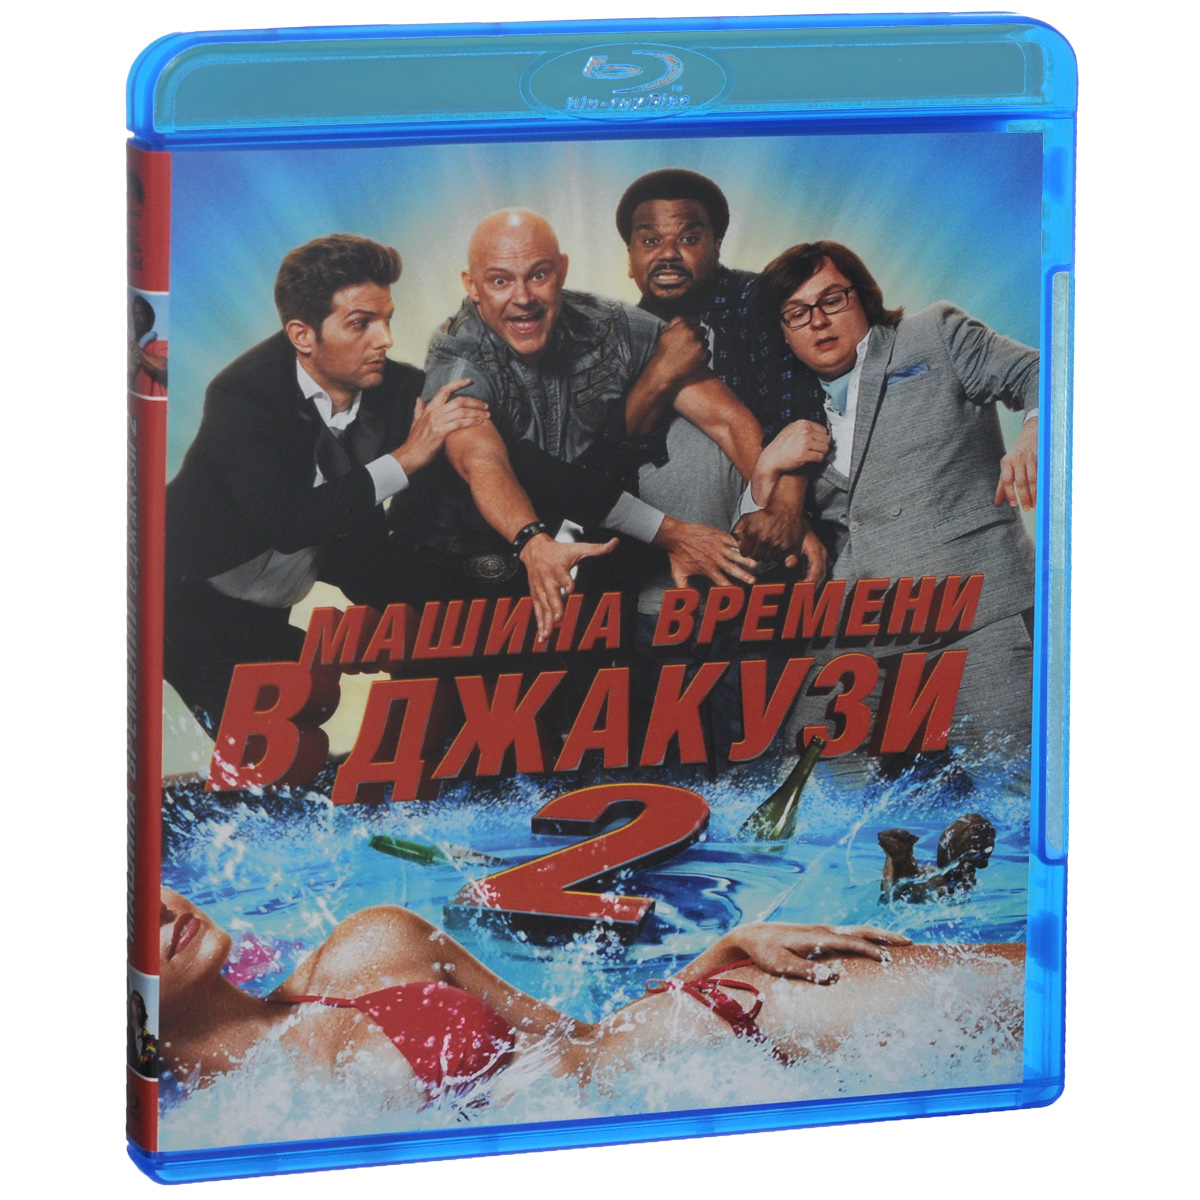 Машина времени в джакузи 2 (Blu-ray)